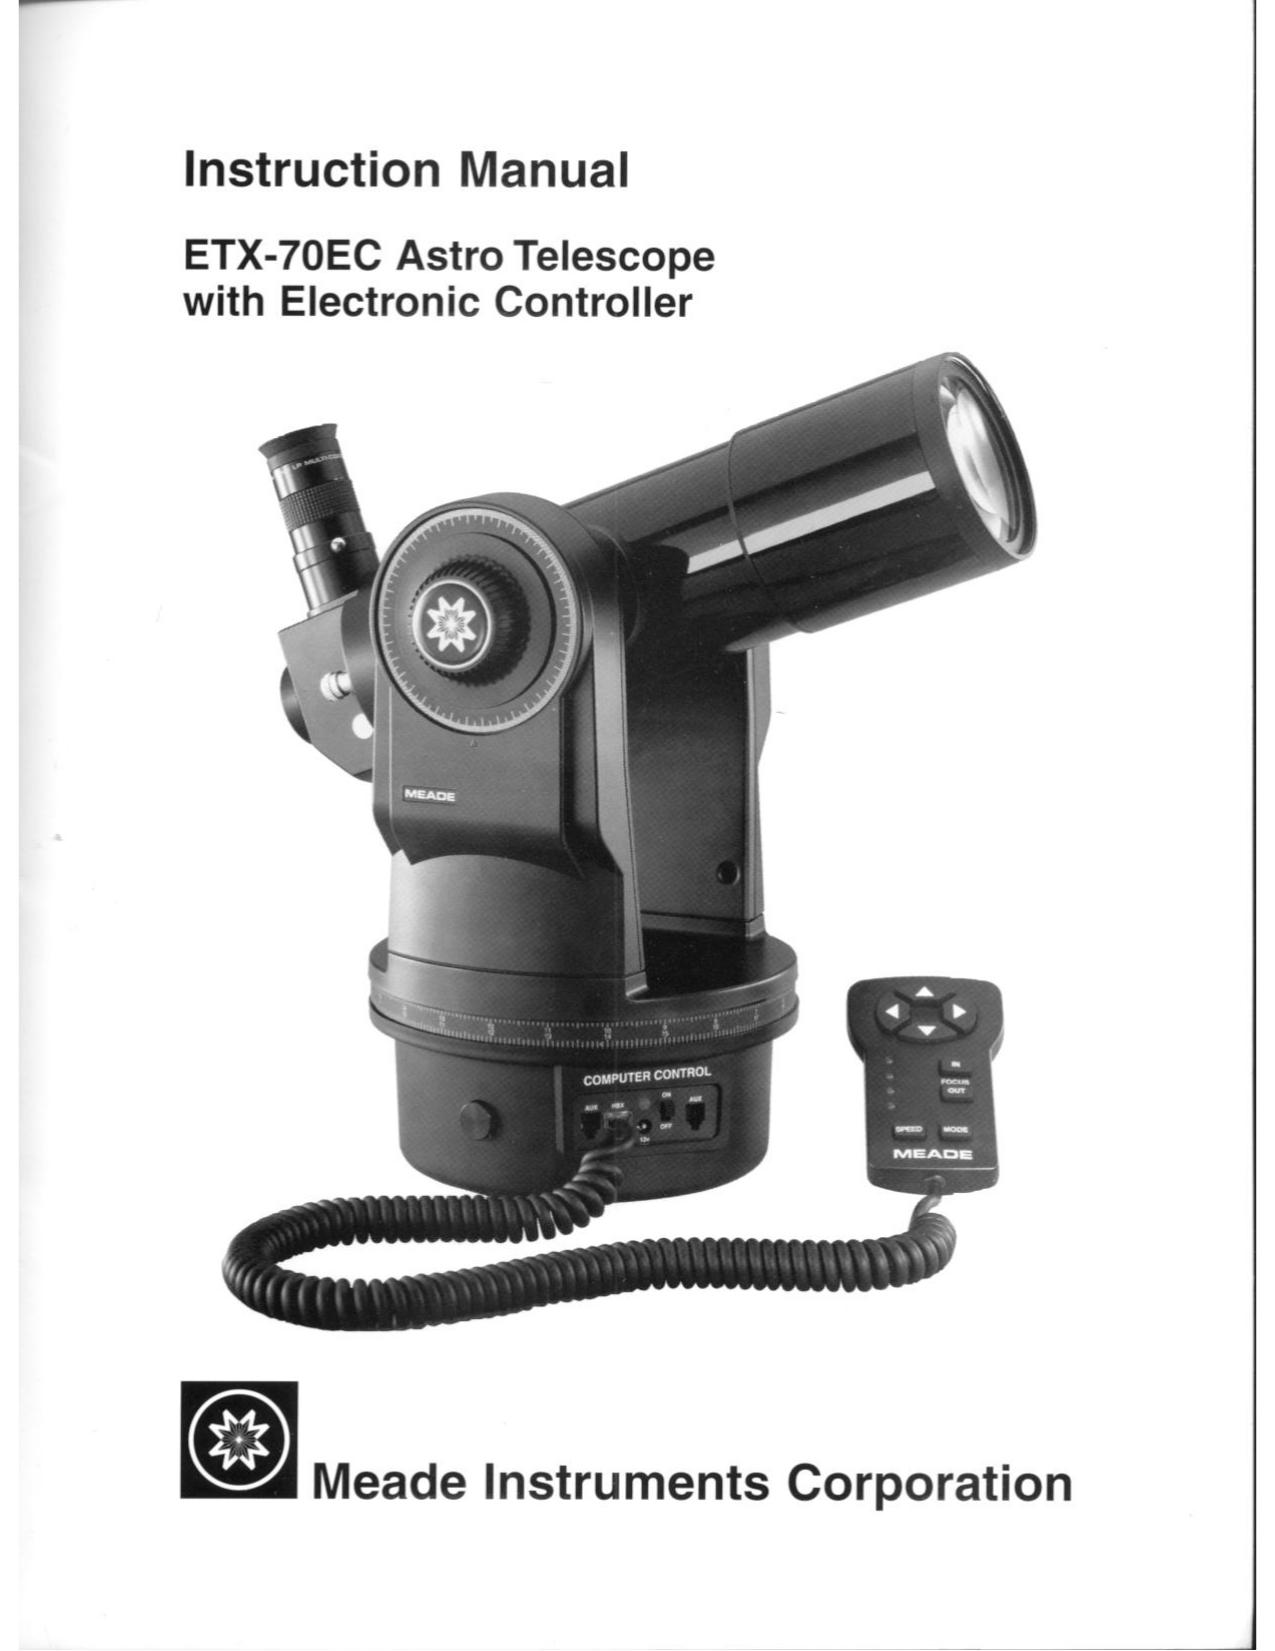 Meade etx-90pe instruction manual pdf download.